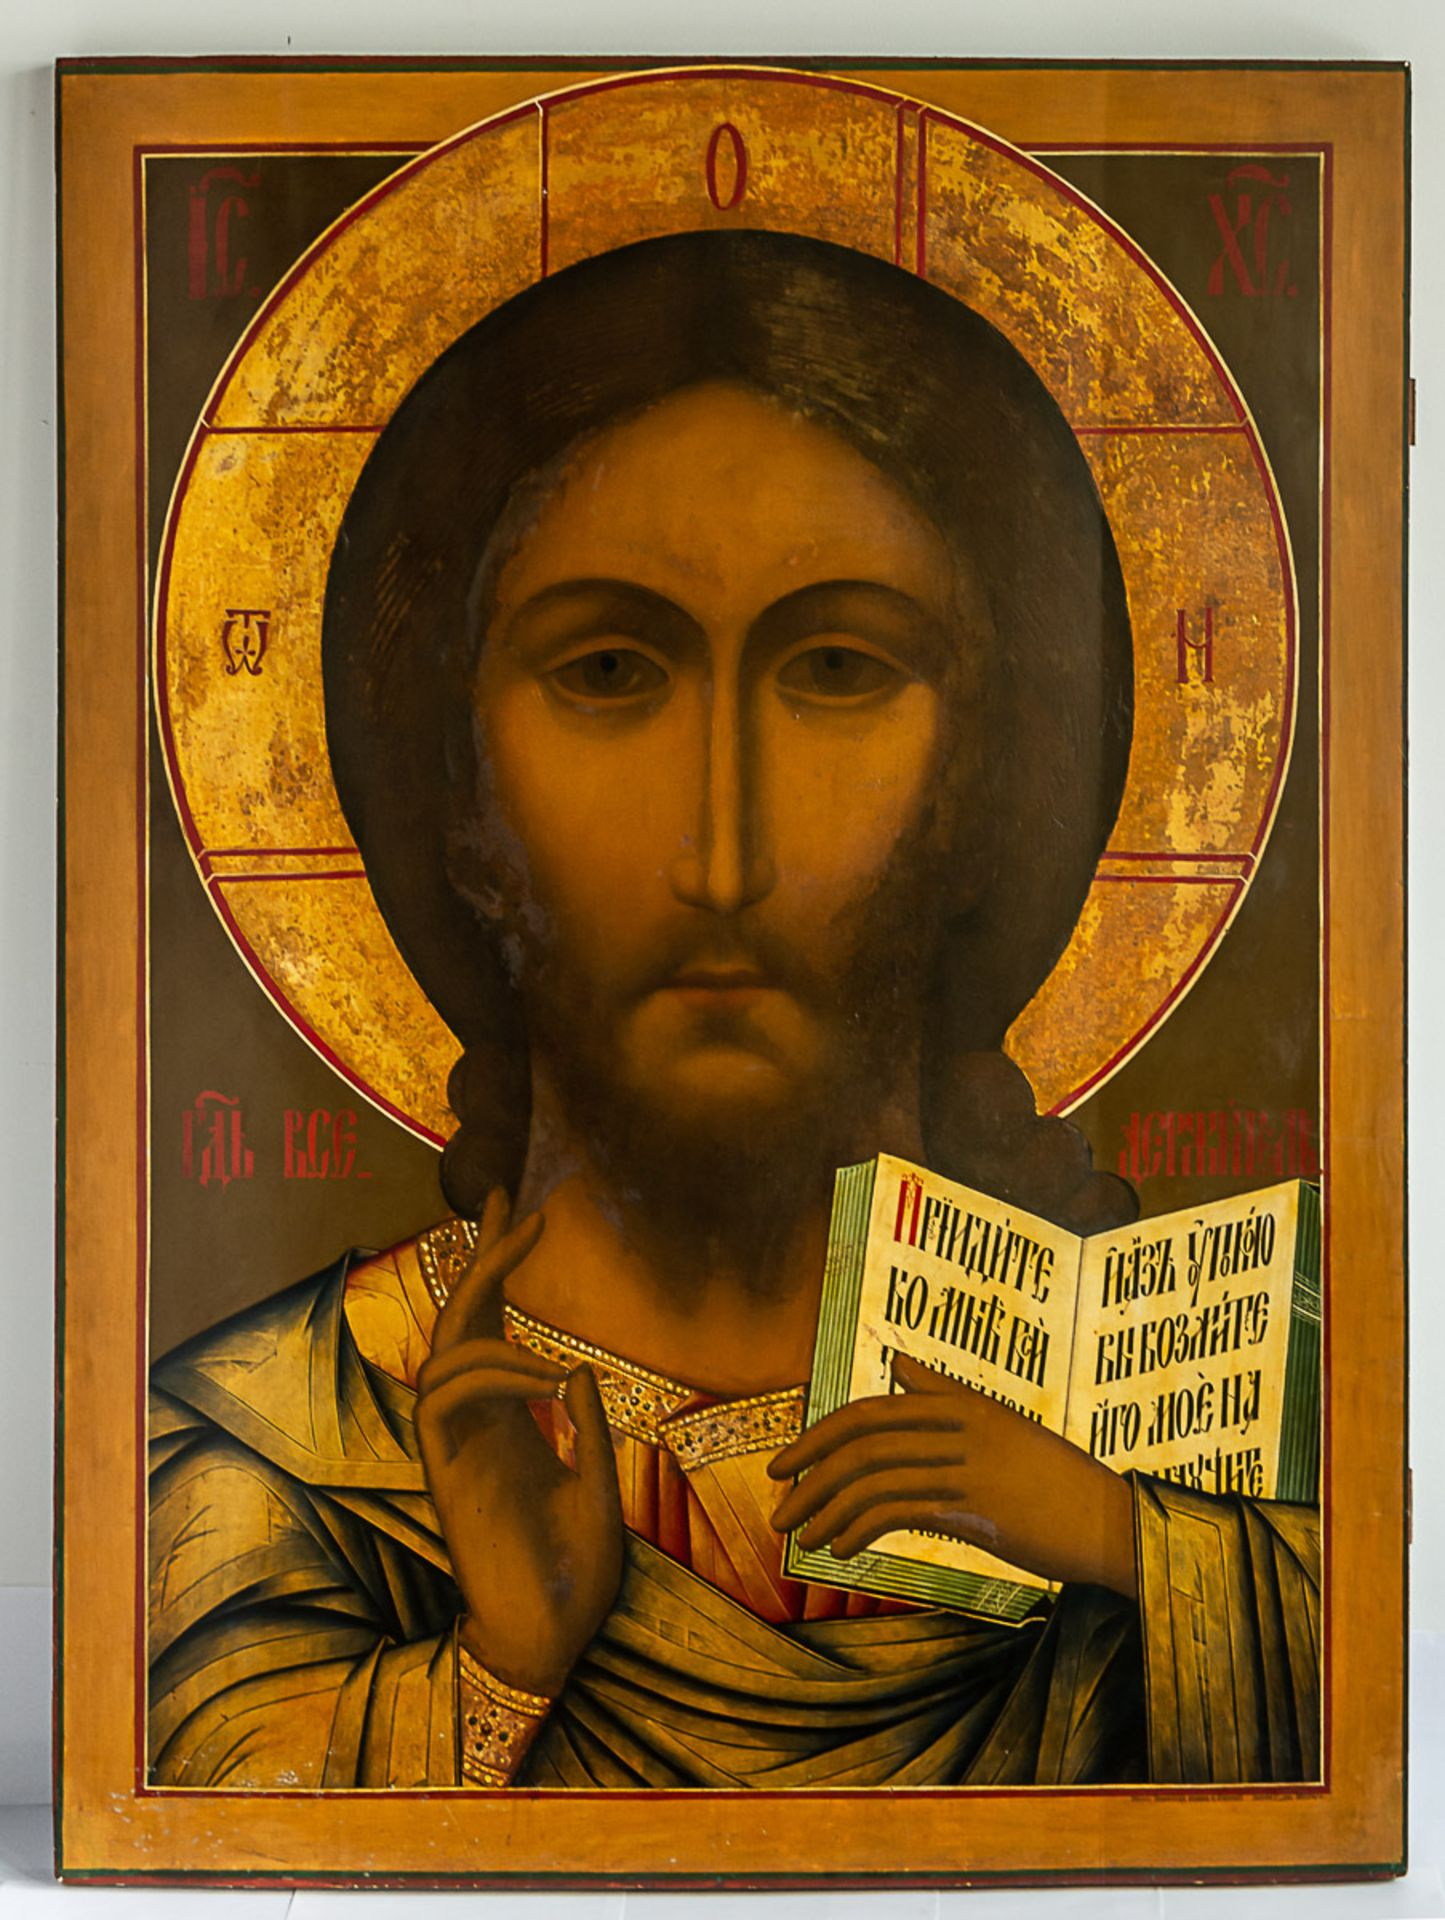 SEGNENDER CHRISTUS - Bild 2 aus 5